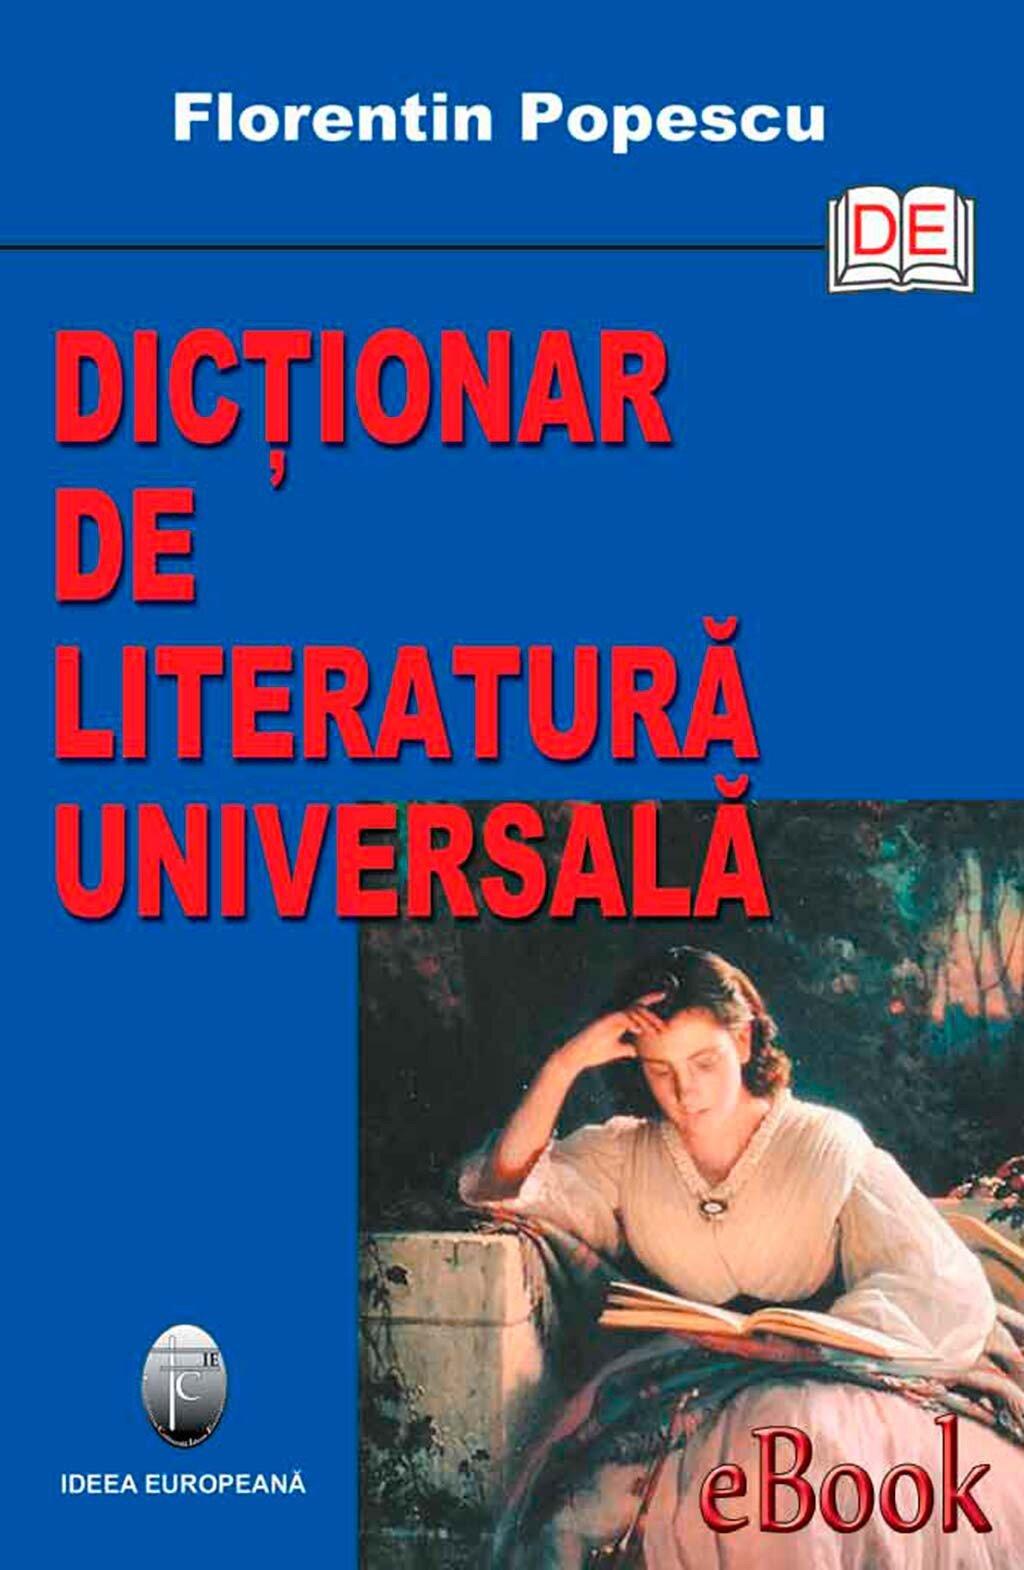 Dictionar de literatura universala (eBook)